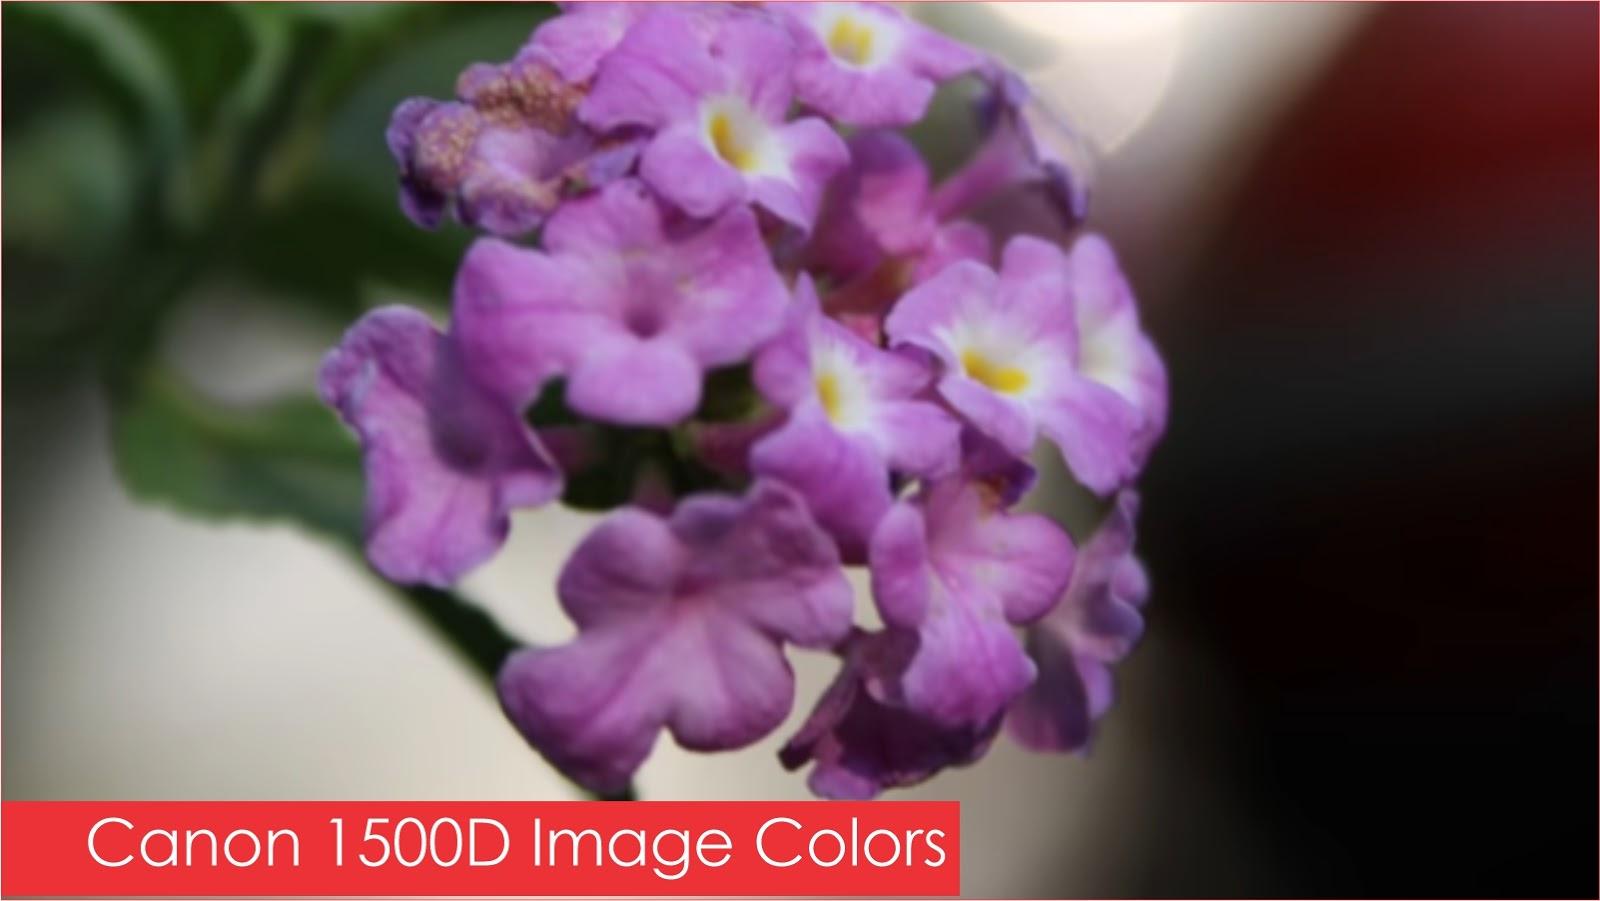 Canon 1500D Camera Image Performance